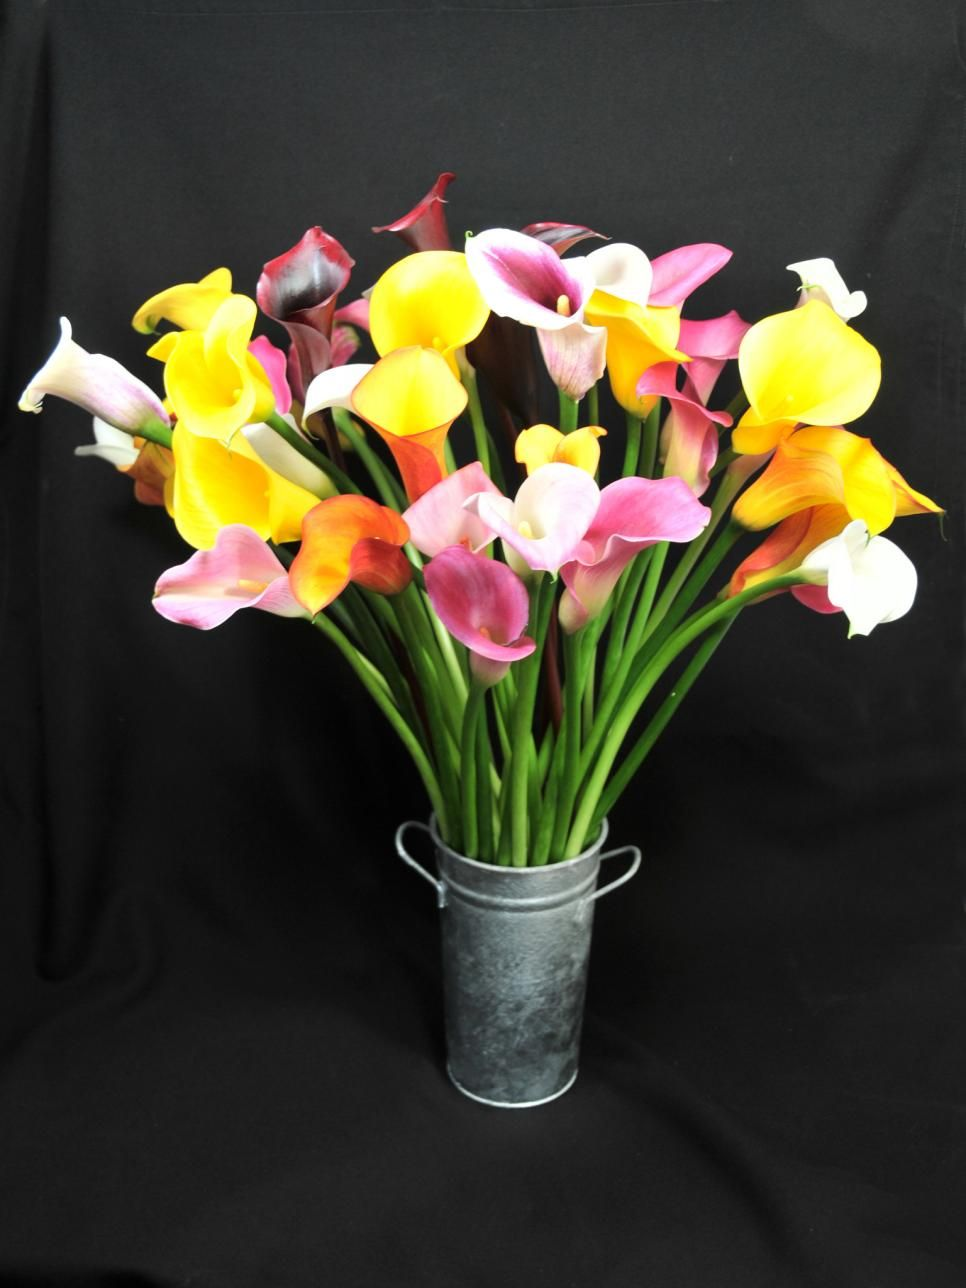 Calla lily varieties calla lilies stargazer and white gardens calla lily varieties izmirmasajfo